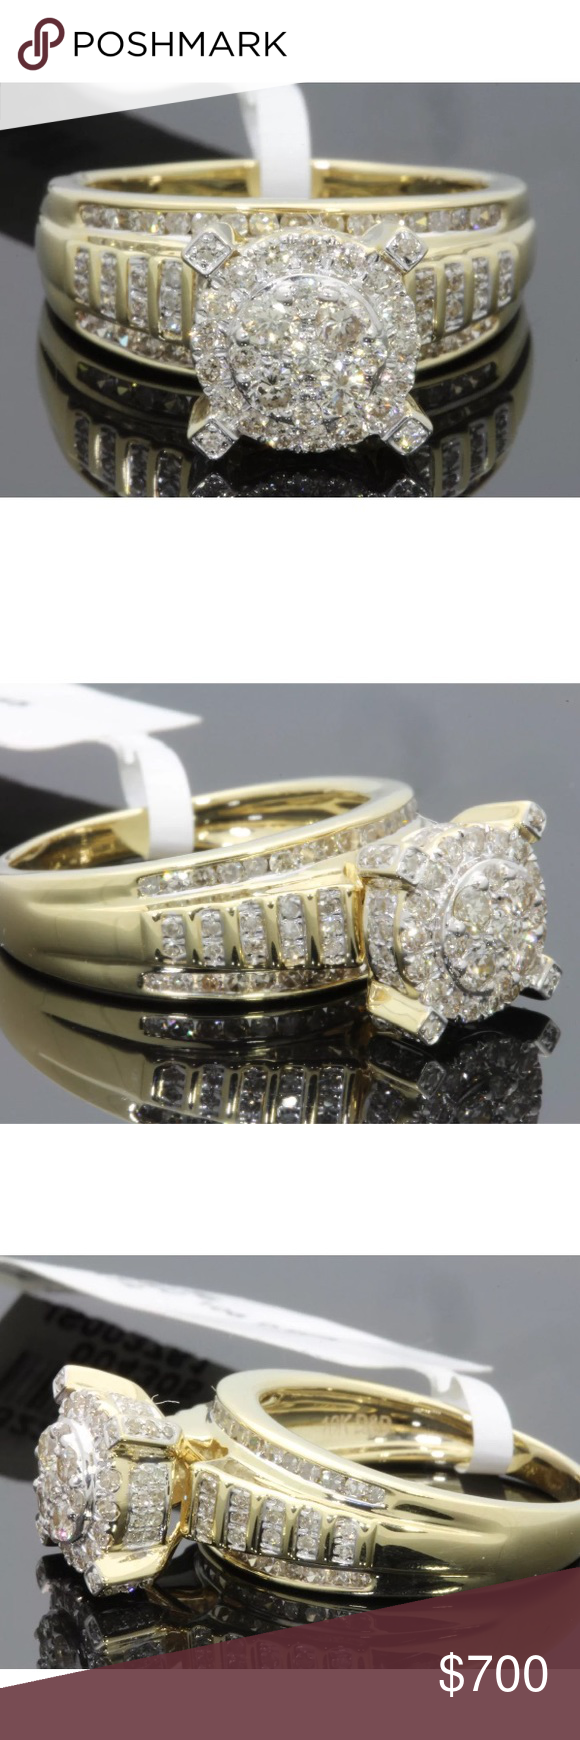 Gorgeous 0.98 carat 10k yellow gold diamond ring Gorgeous 0.98 carat 10k yellow gold diamond ring Jewelry Rings